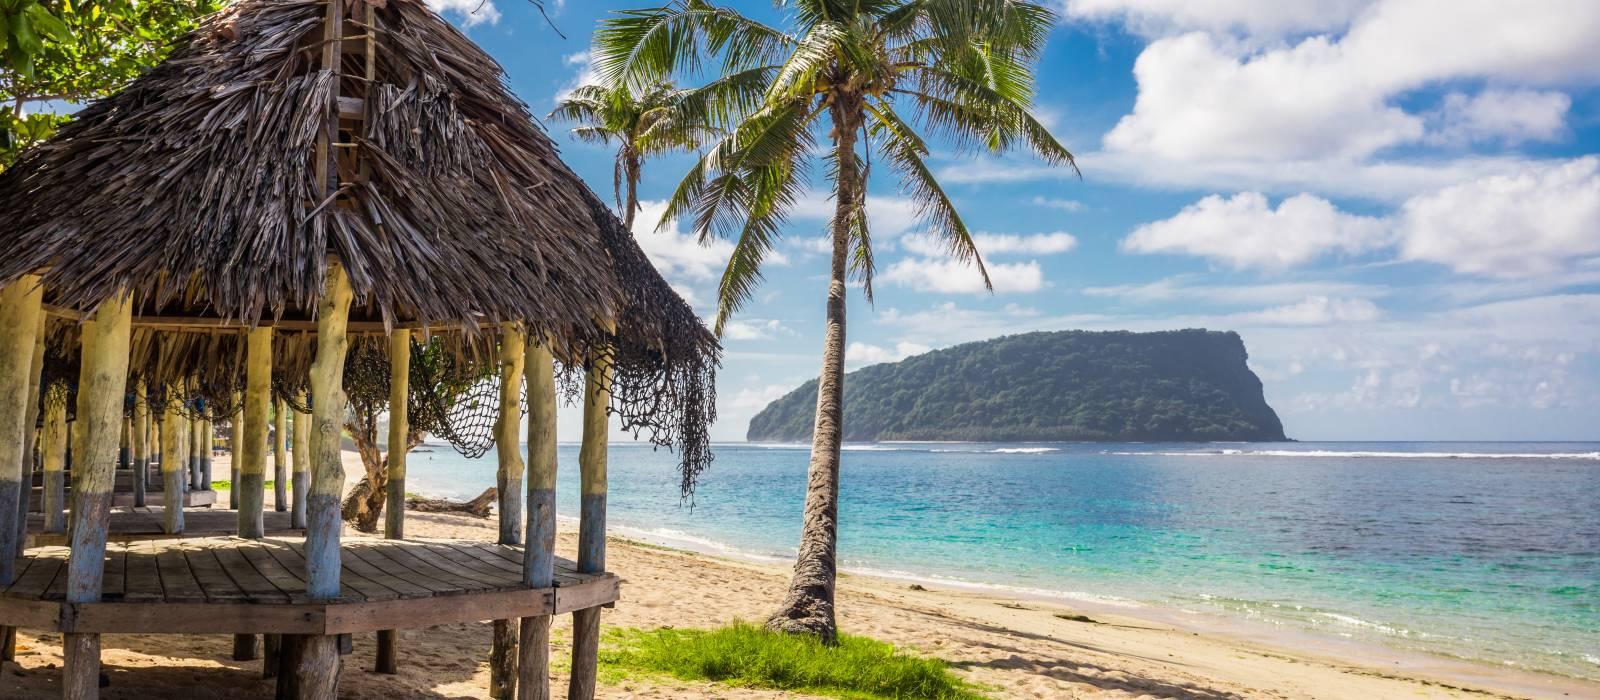 Best time to visit Samoa